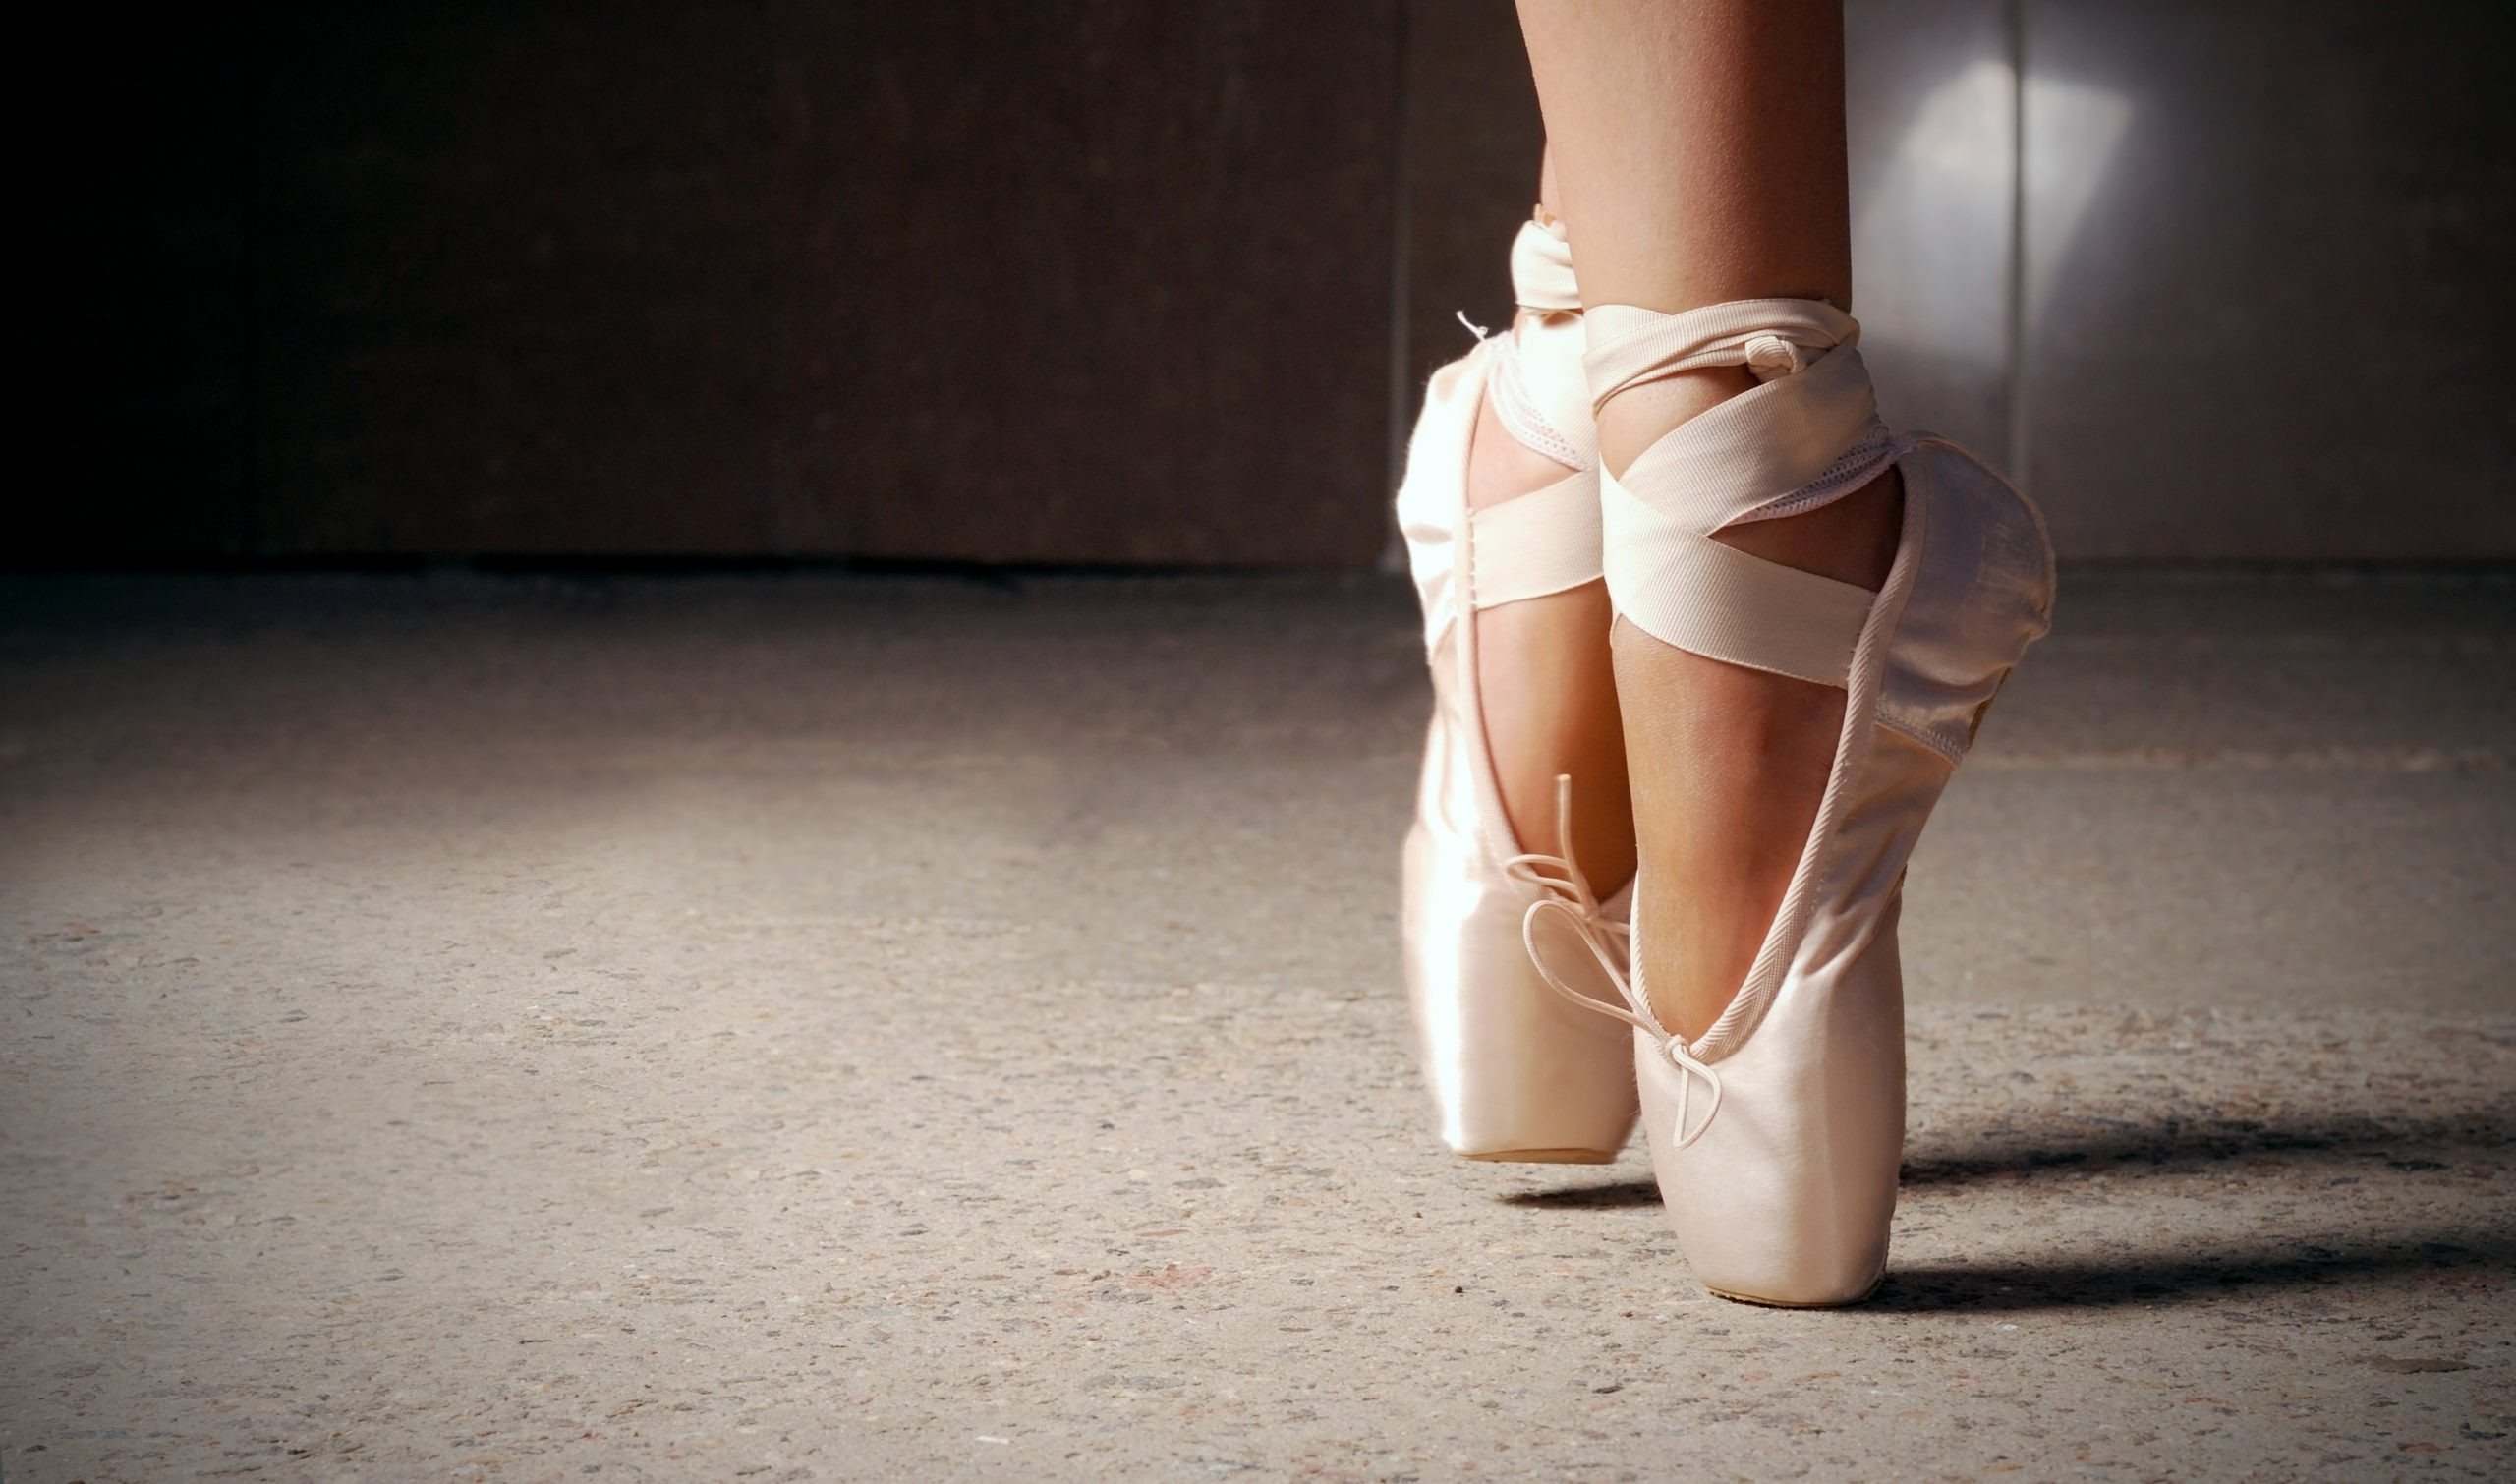 Feet of ballerina dancing in ballet shoes over a dark background